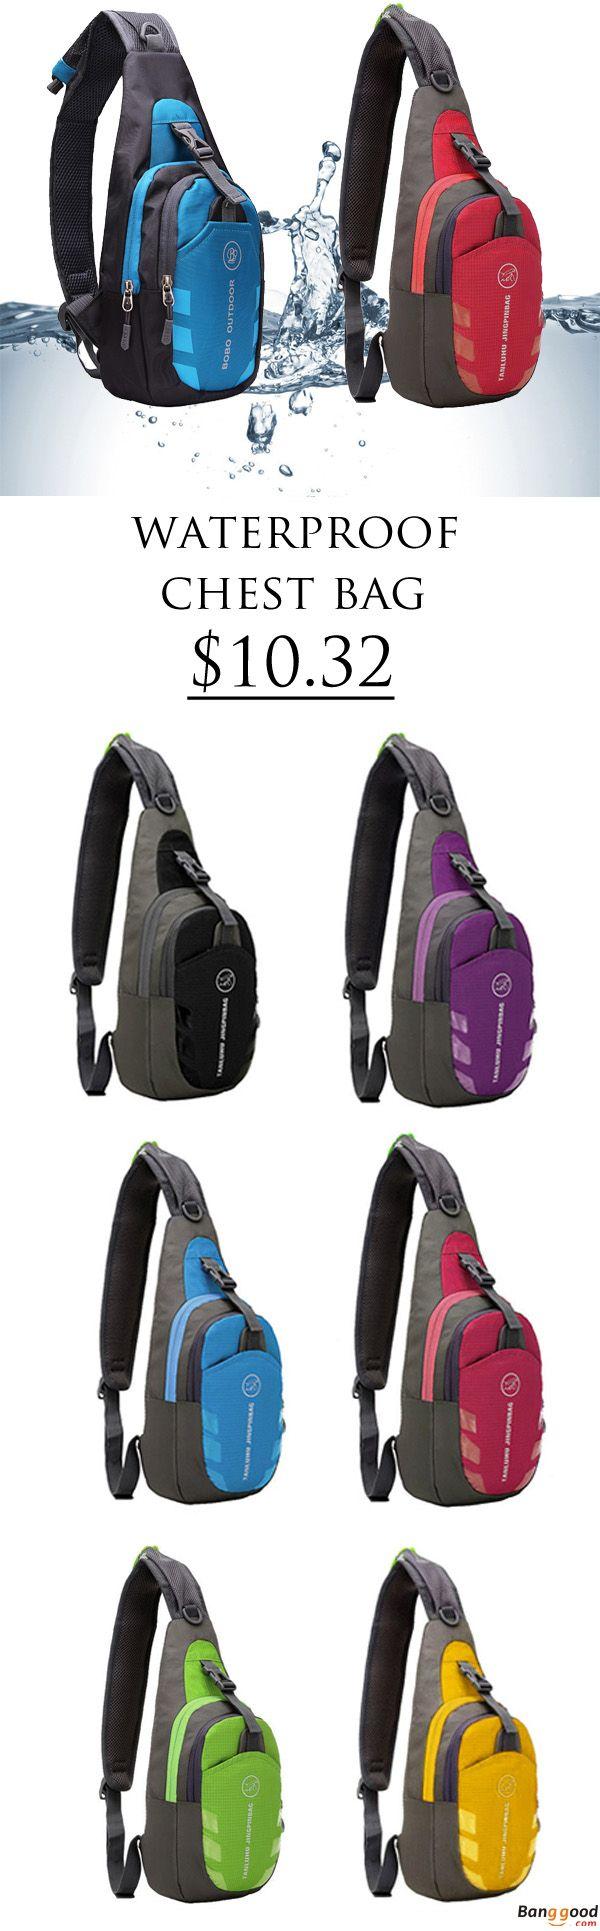 US$10.32 + Free Shipping. Men Bag, Waterproof Bag, Sport Bag, Chest Bag, Shoulder Bag, Crossbody Bag. 10 Colors to Choose. Pick Your Own Style!